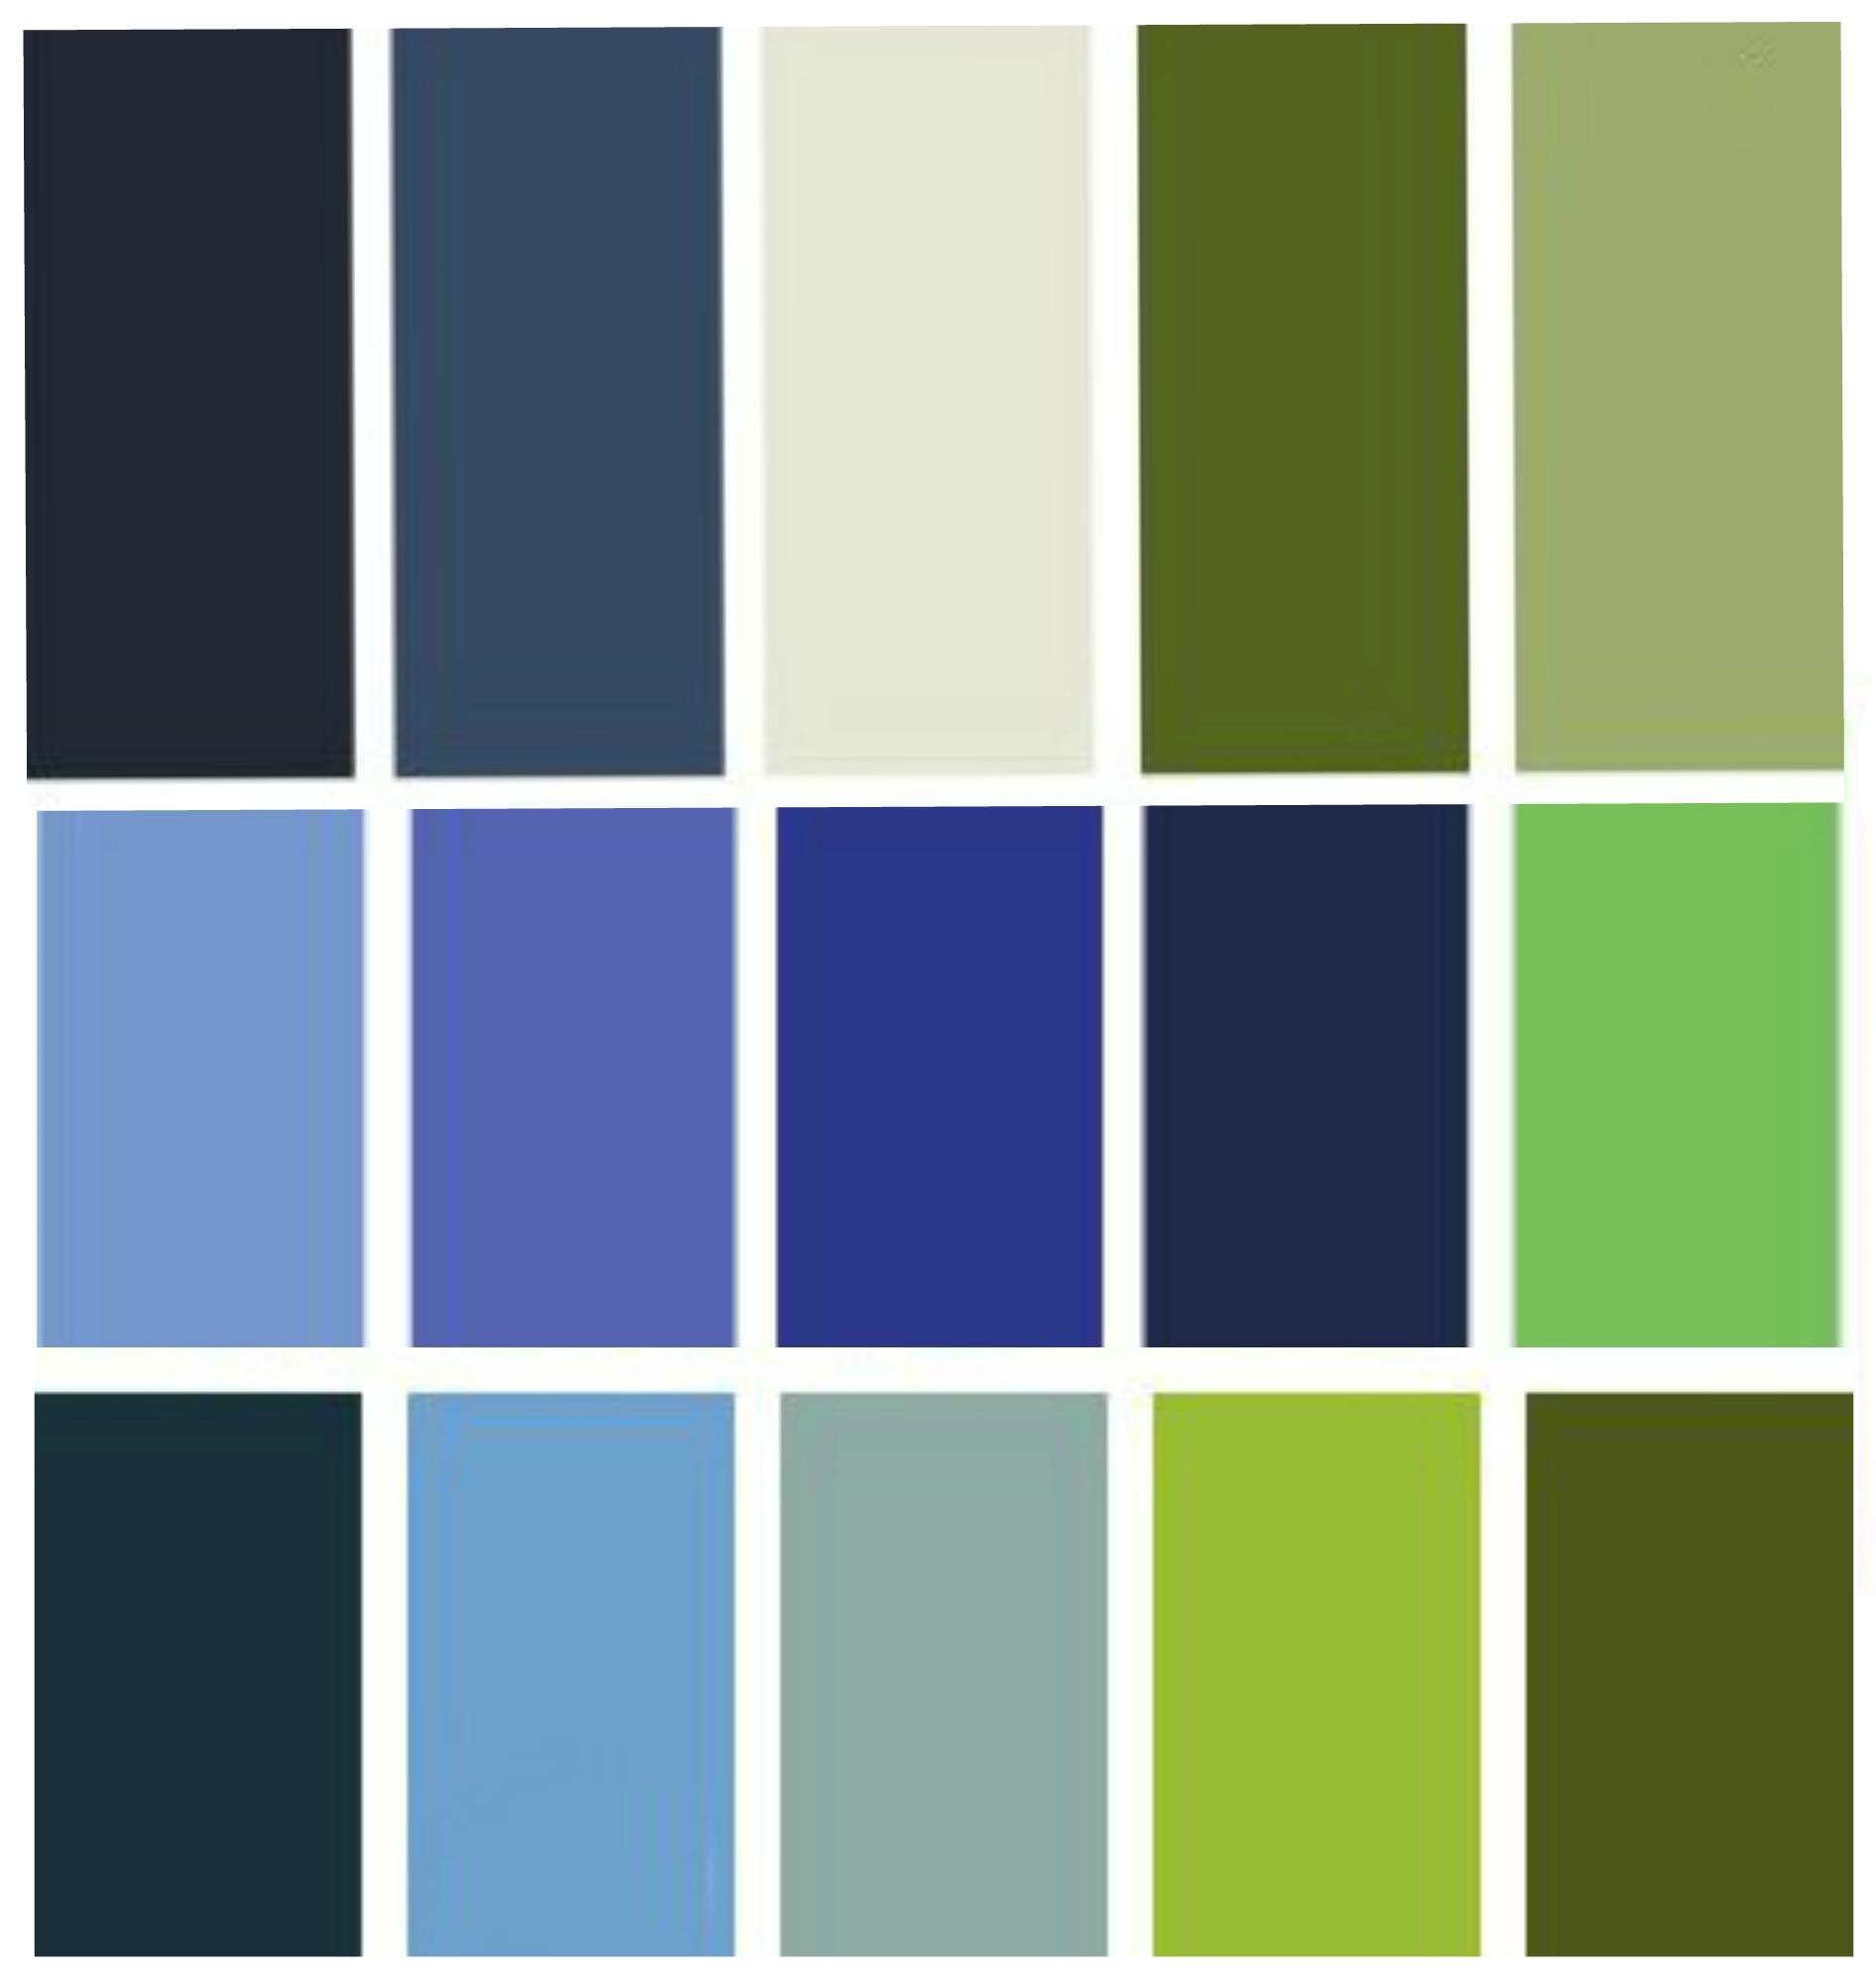 housecolorscheme